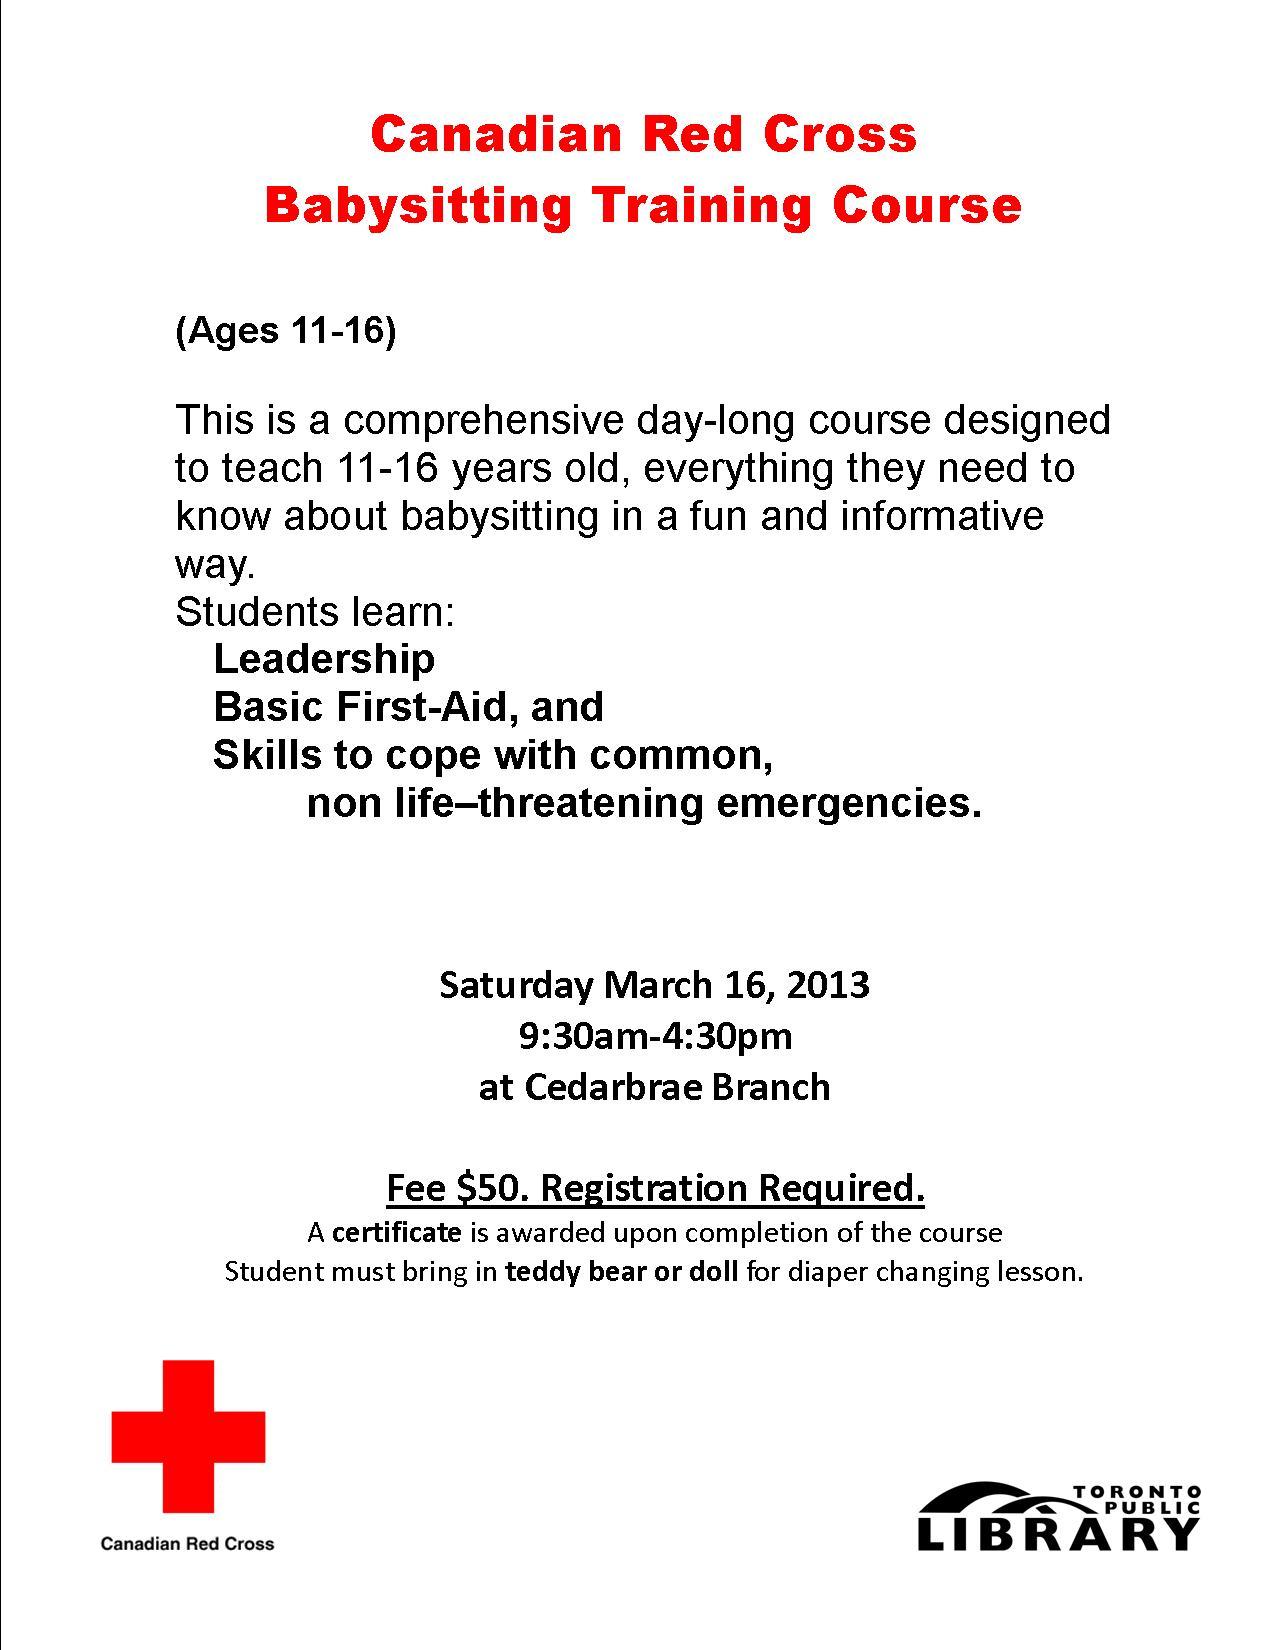 tpl teens break cedarbrae canadian red cross red cross babysitting course 1